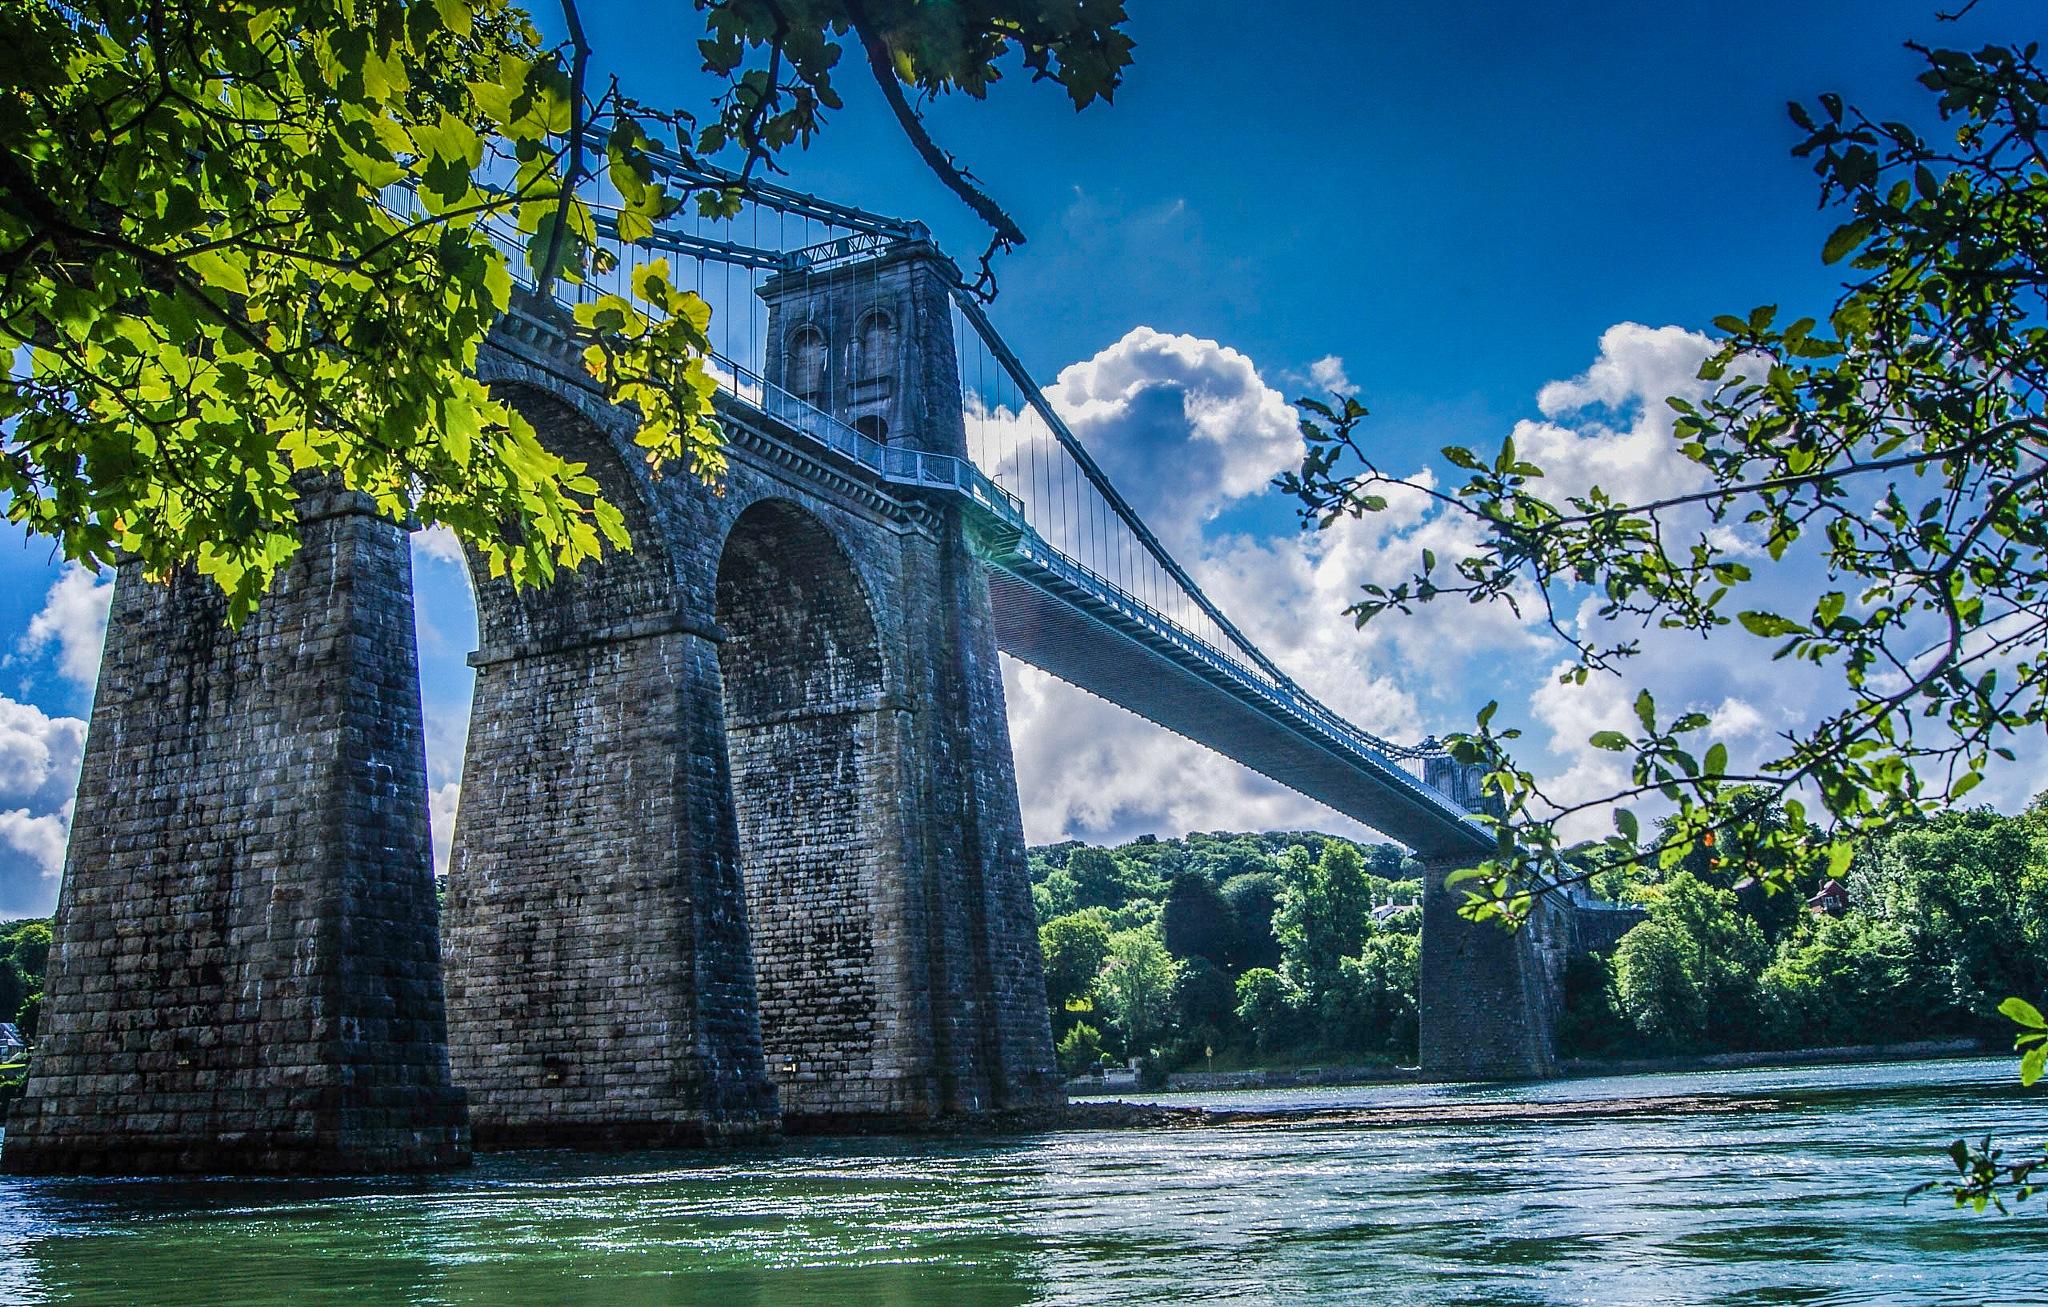 Menai Bridge Suspension Bridge by rfoulkes